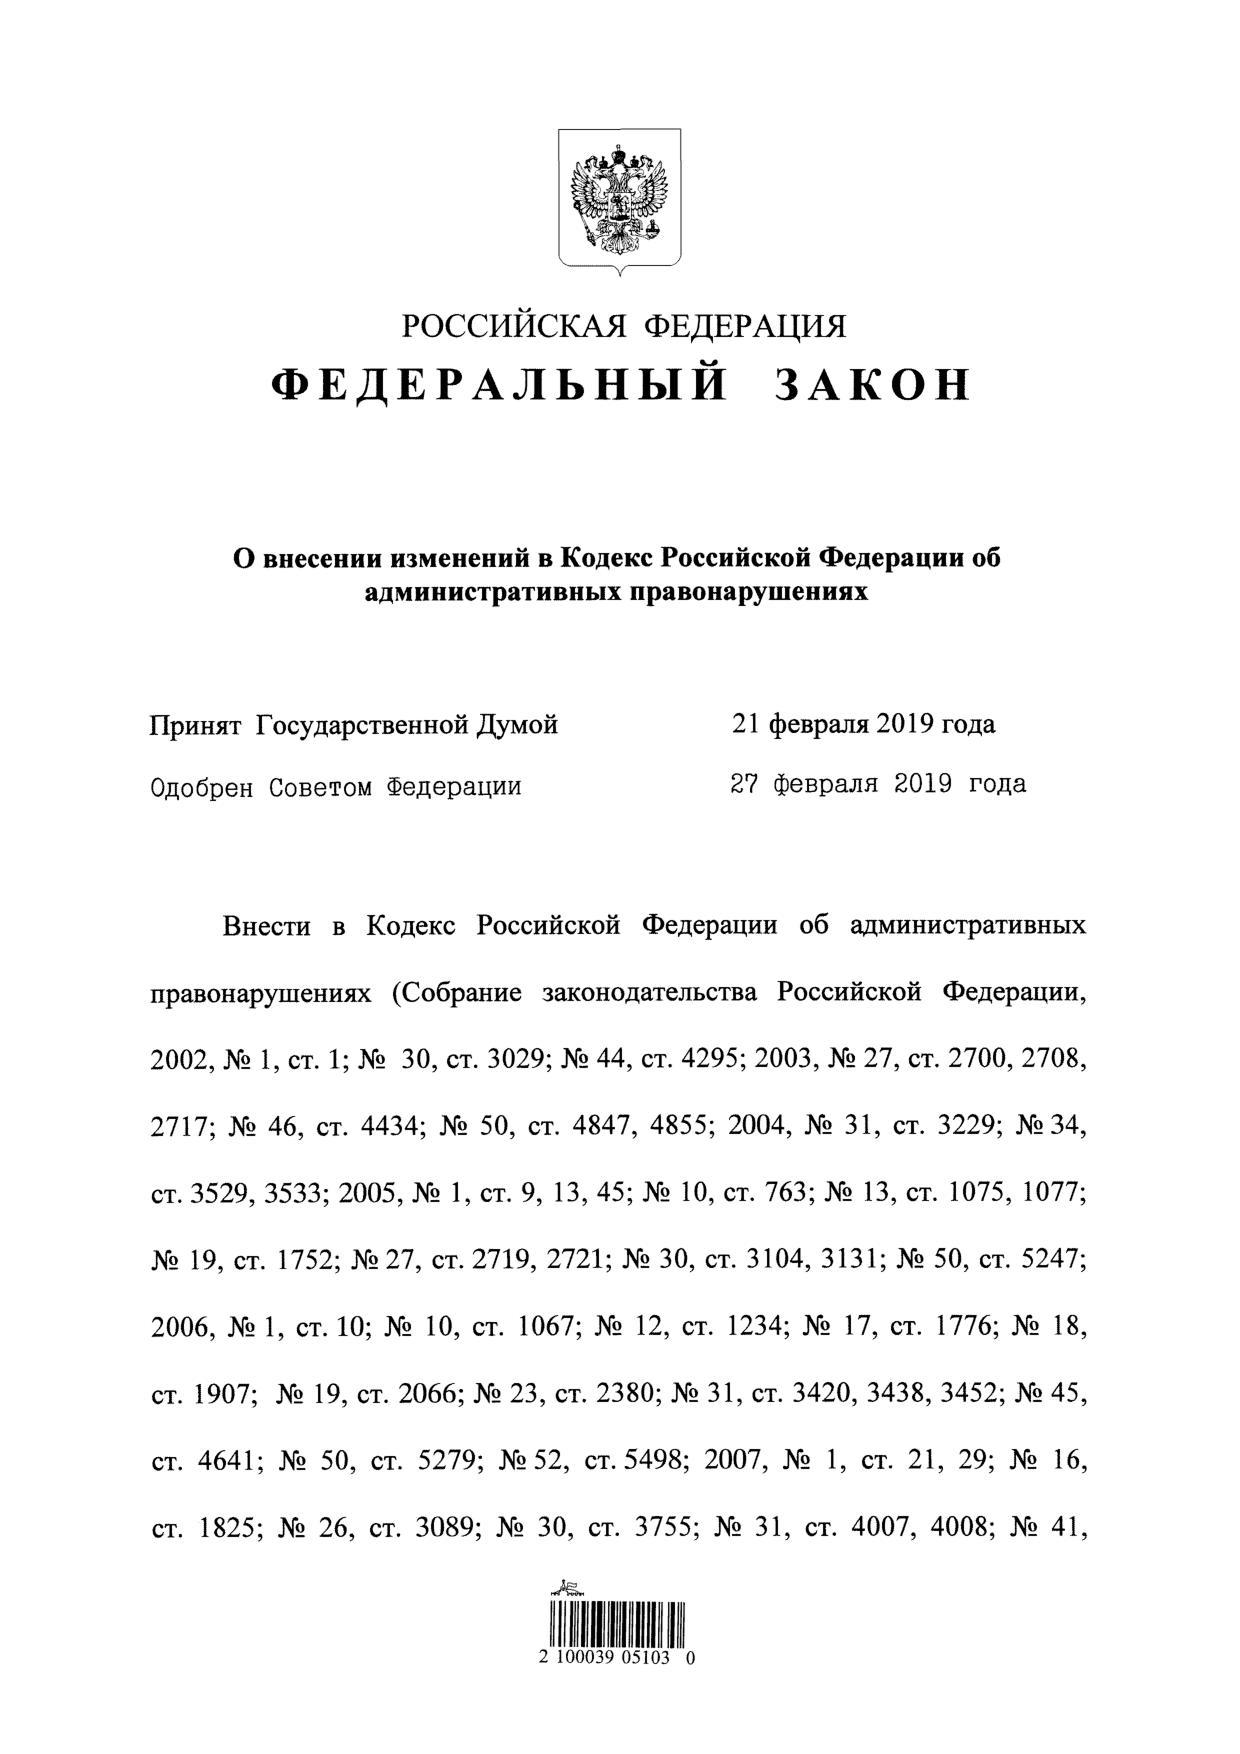 Путин подписал закон о штрафах за нарушение правил безопасности лифтов